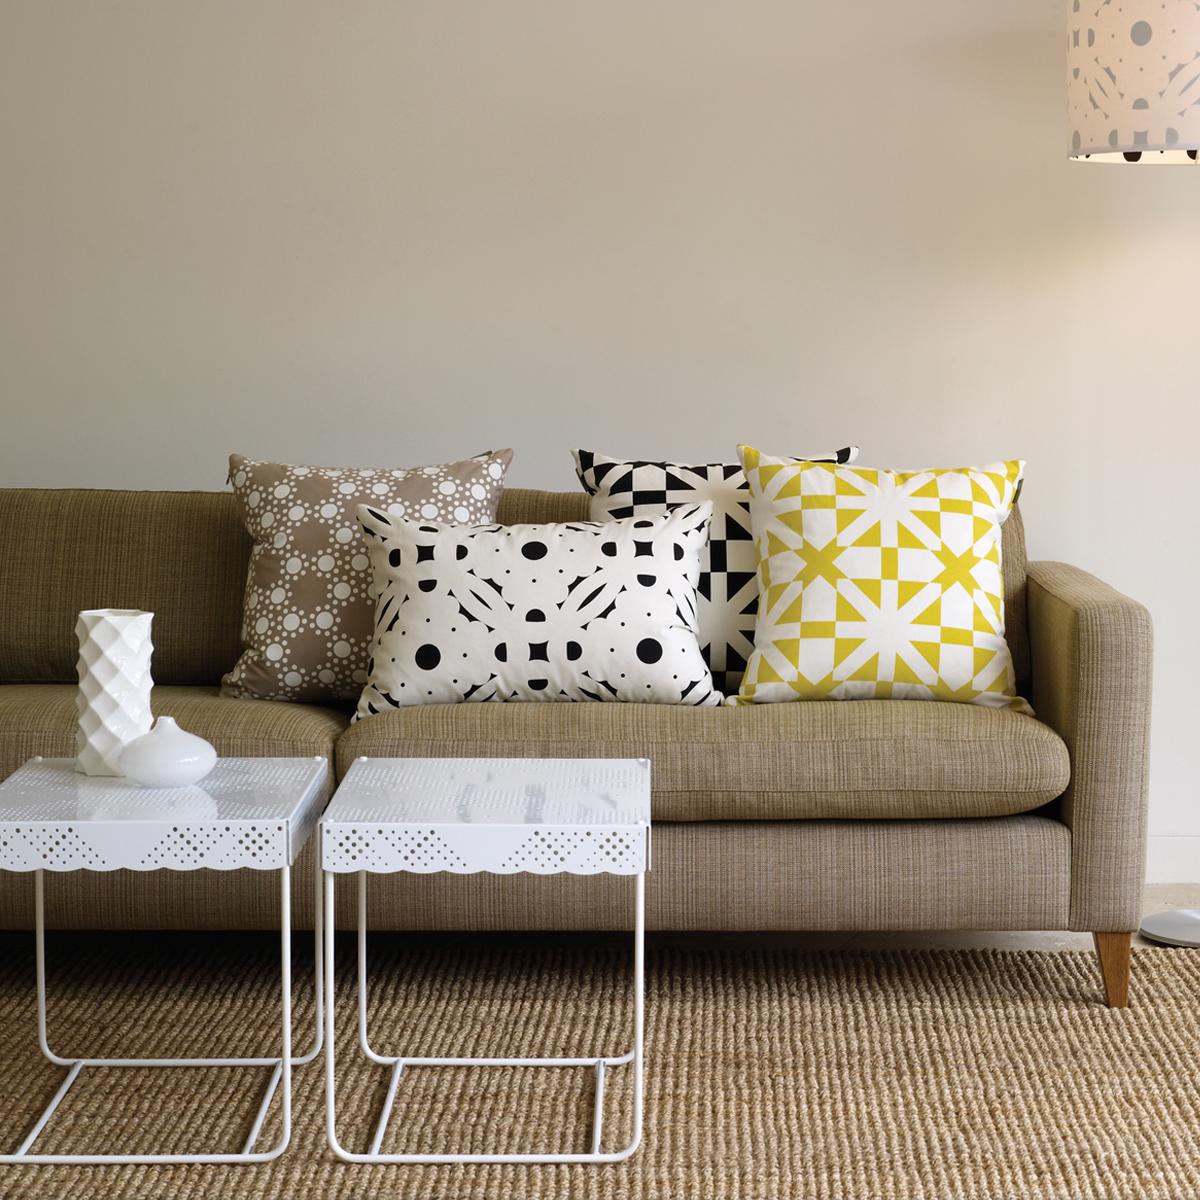 1200x1200_furniture.jpg